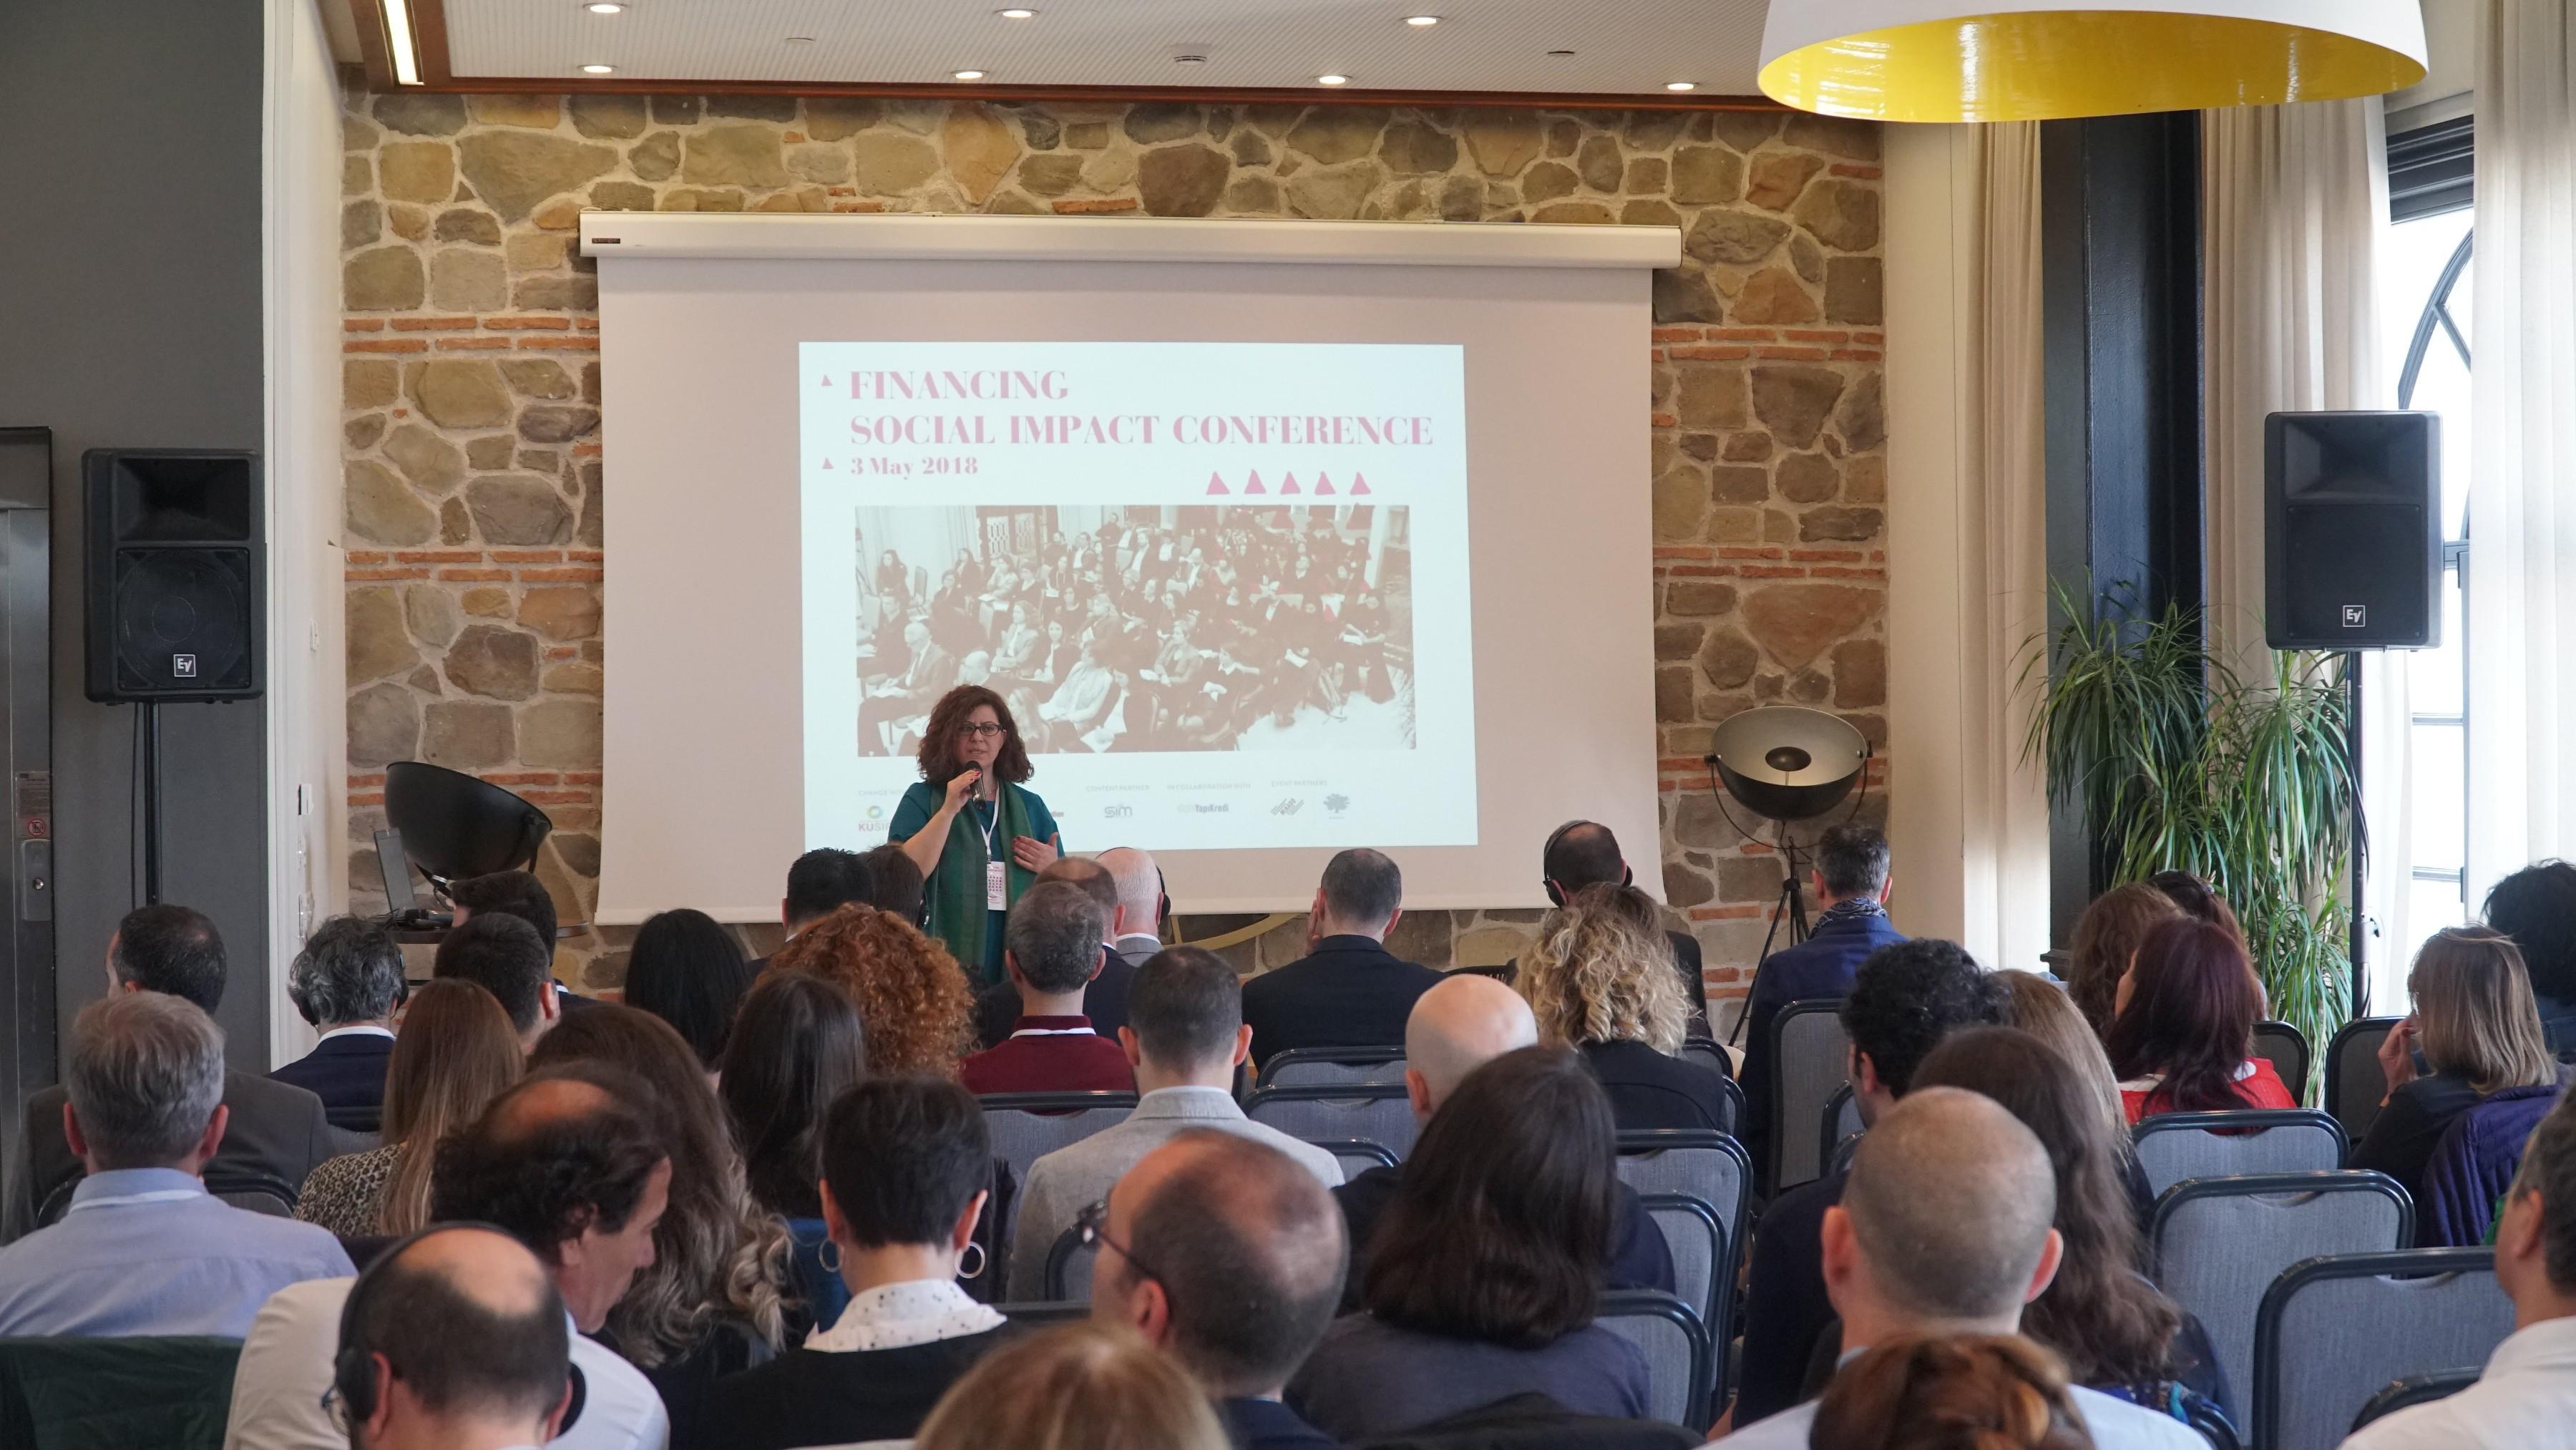 Financing Social Impact Conference Sosyal Fi̇nansman Sektöründen Uzmanlari Bi̇r Araya Geti̇rdi̇